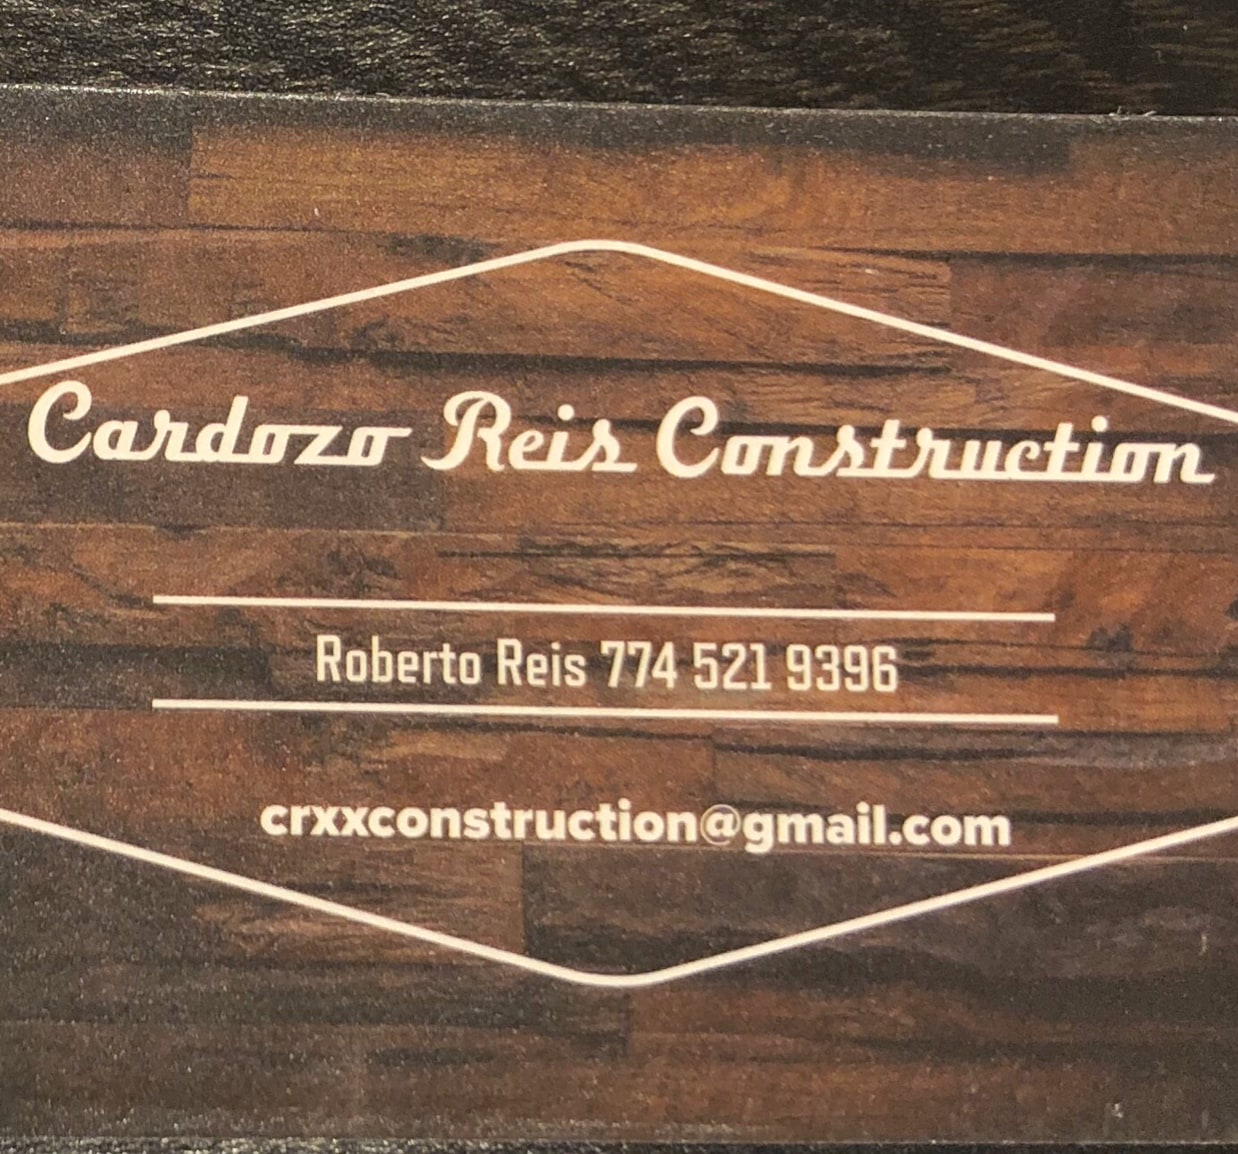 Cardozo Reis Construction